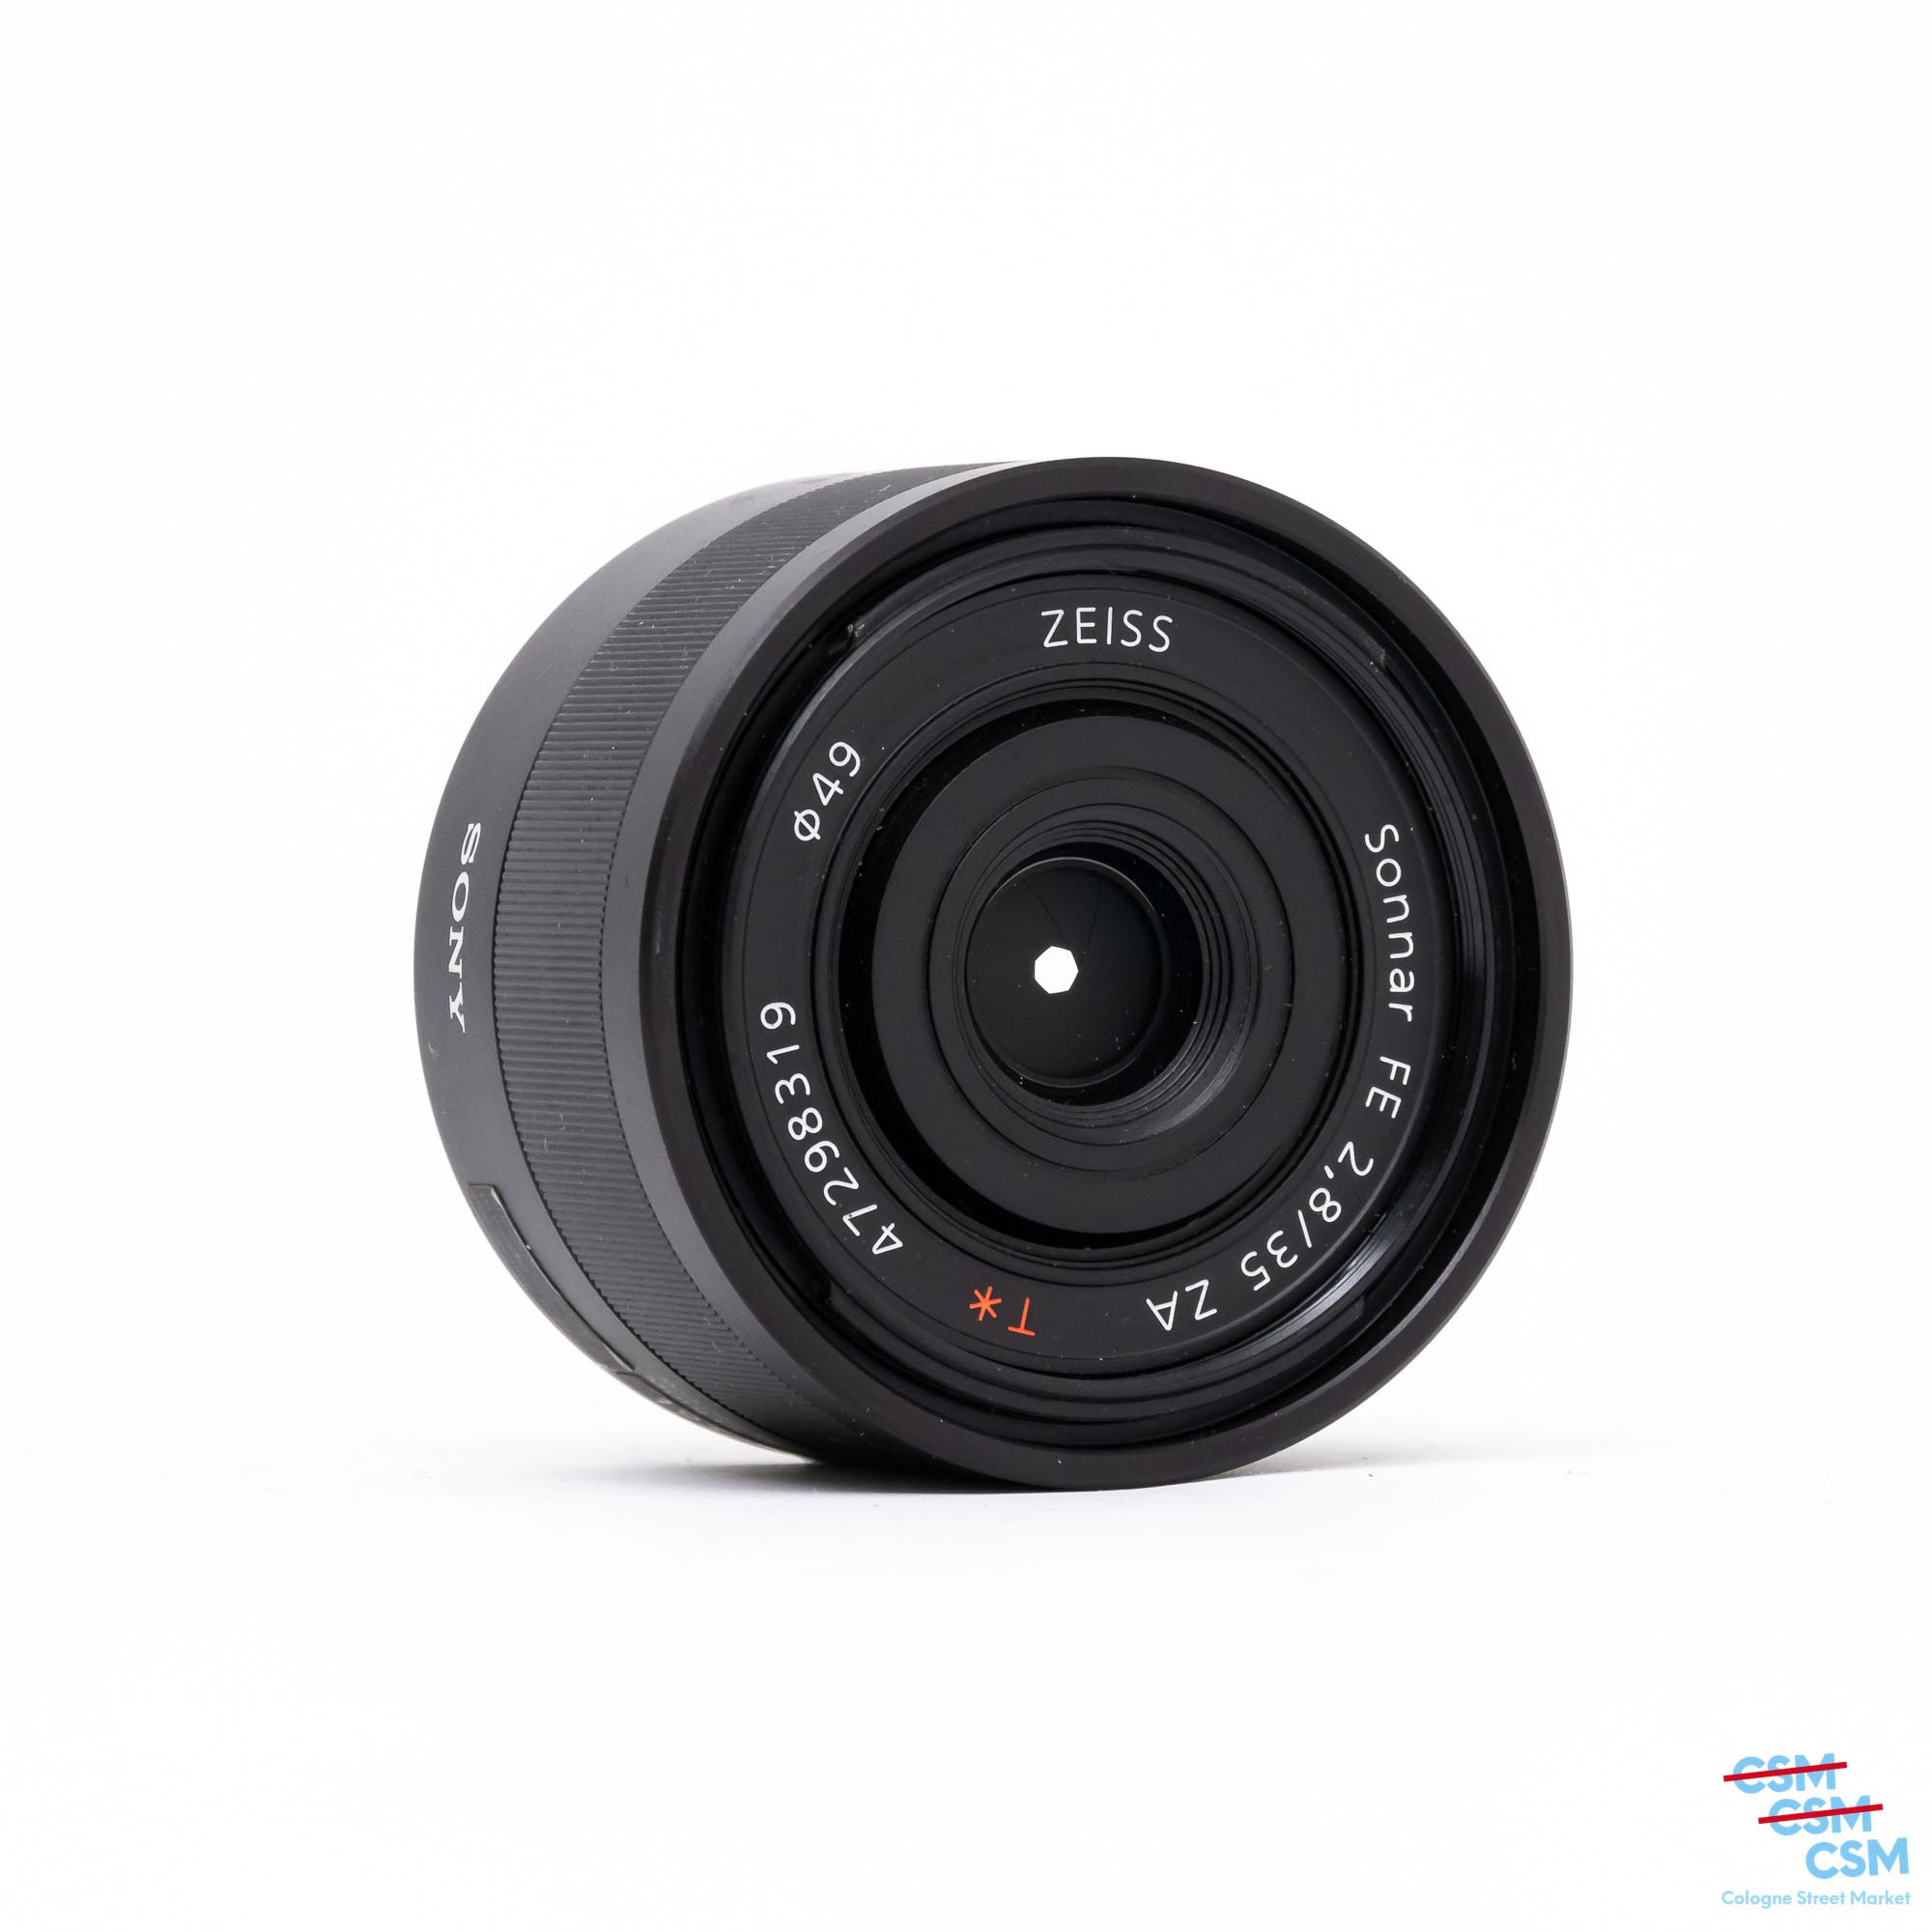 Sony Sonnar T FE 35mm f2.8 Zeiss gebraucht 1